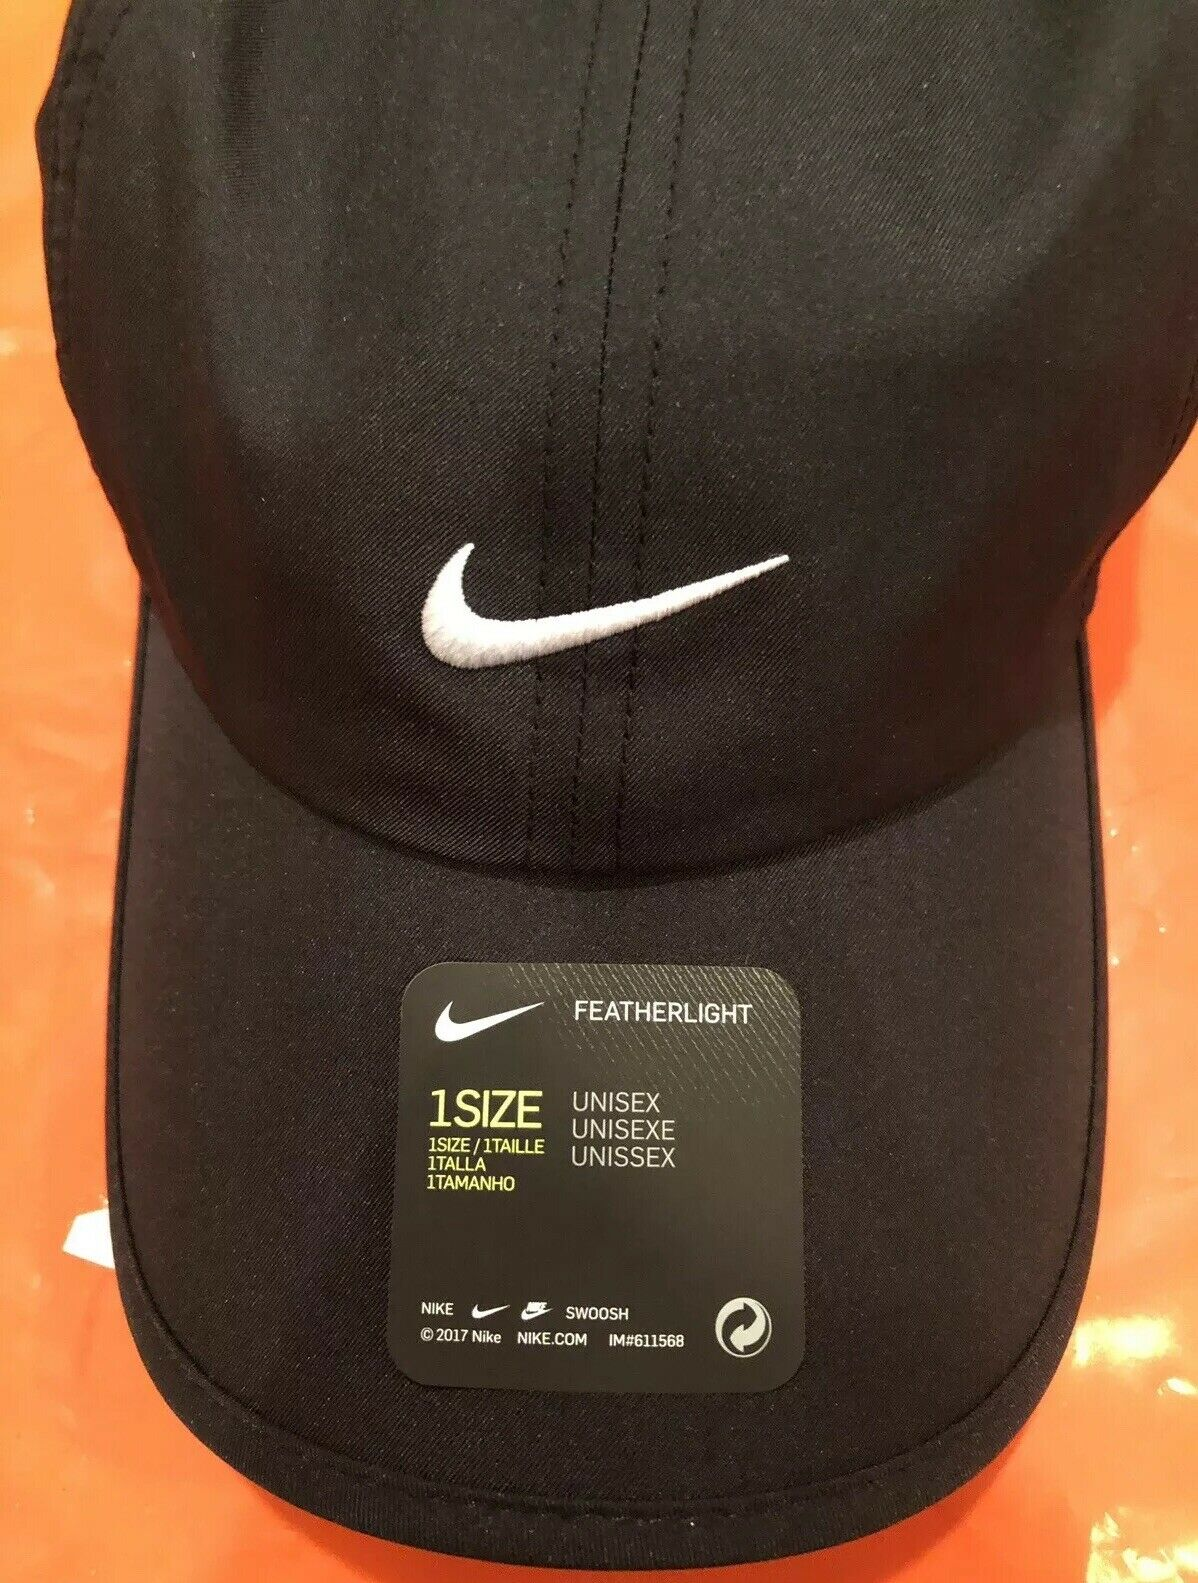 d19754595 Nike Aerobill Featherlight Dri-Fit Black Unisex Tennis/Running Cap  CI2662-010